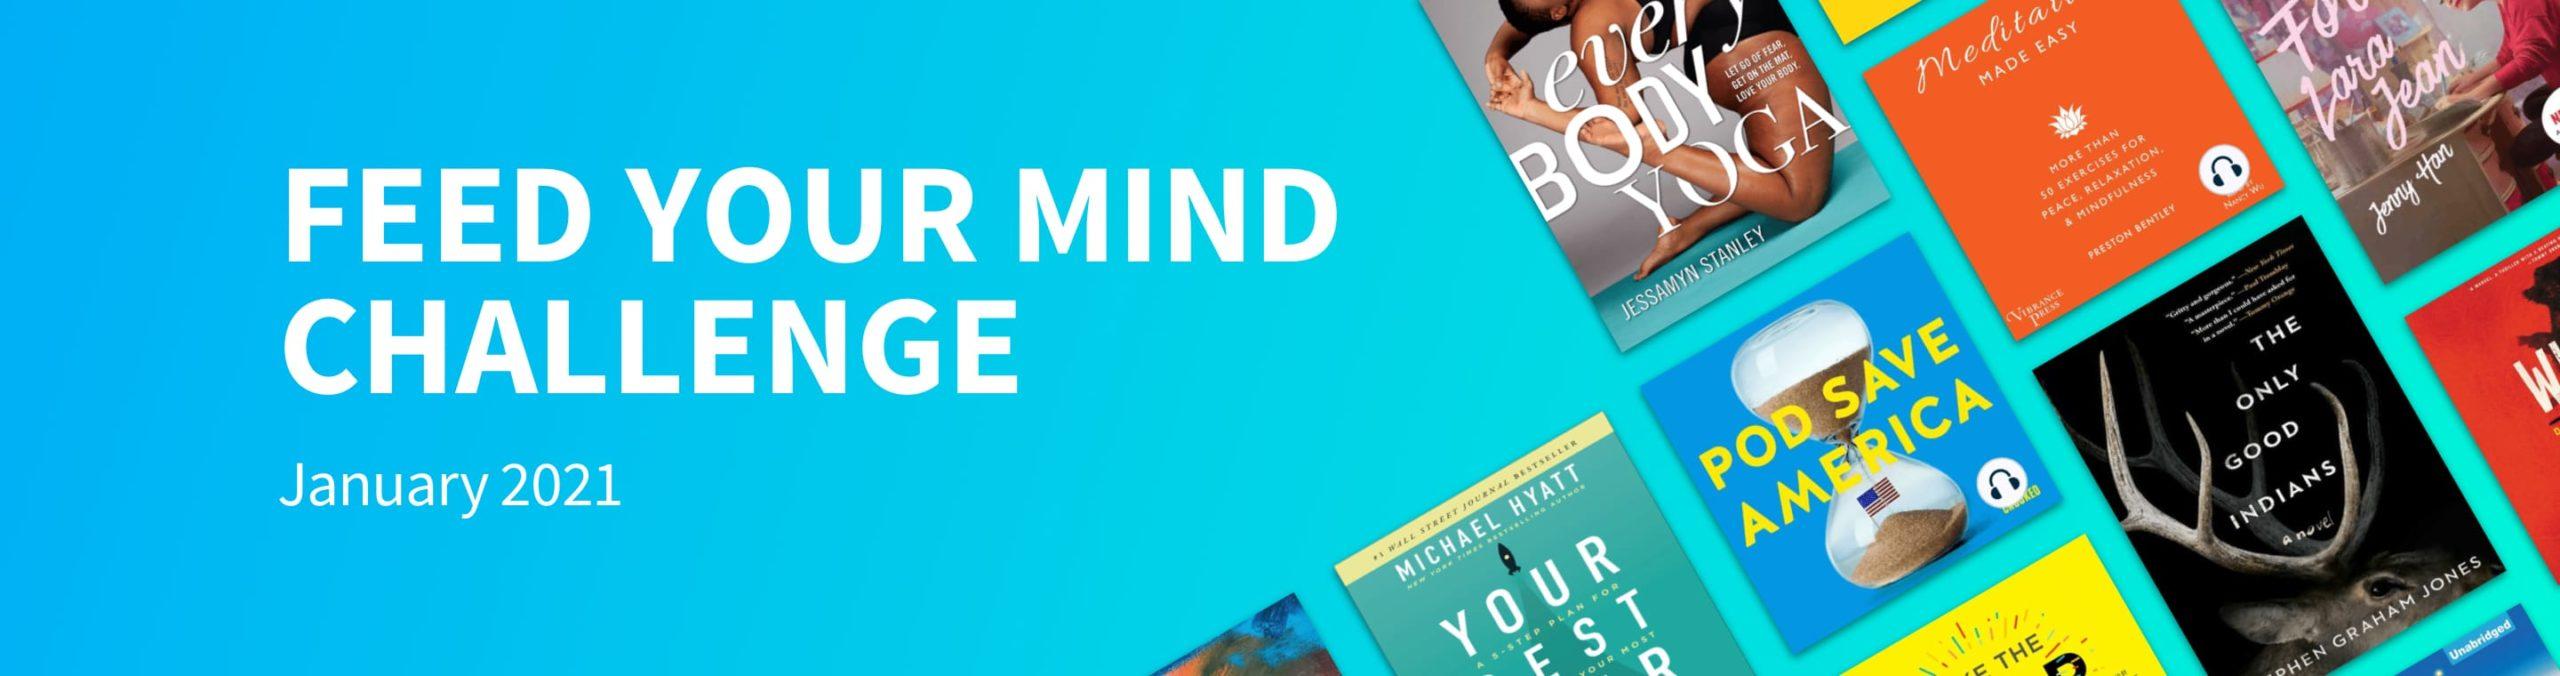 Scribd's Feed Your Mind Challenge kickoff